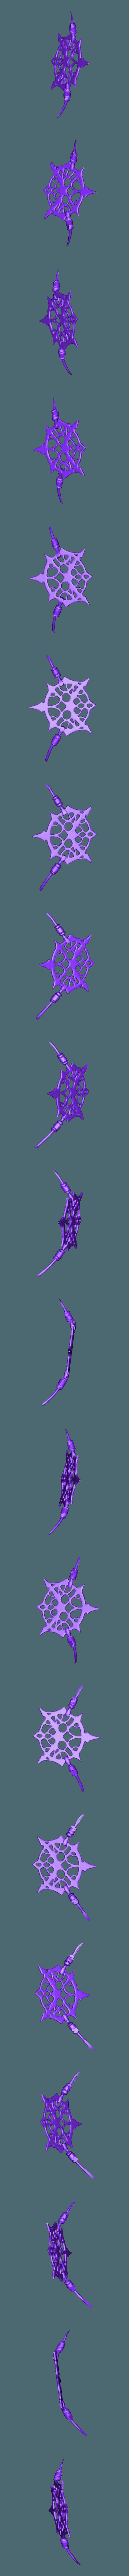 Accessory_Belt.stl Download free STL file SINoALICE composite, printable • 3D printable model, HARZLabs